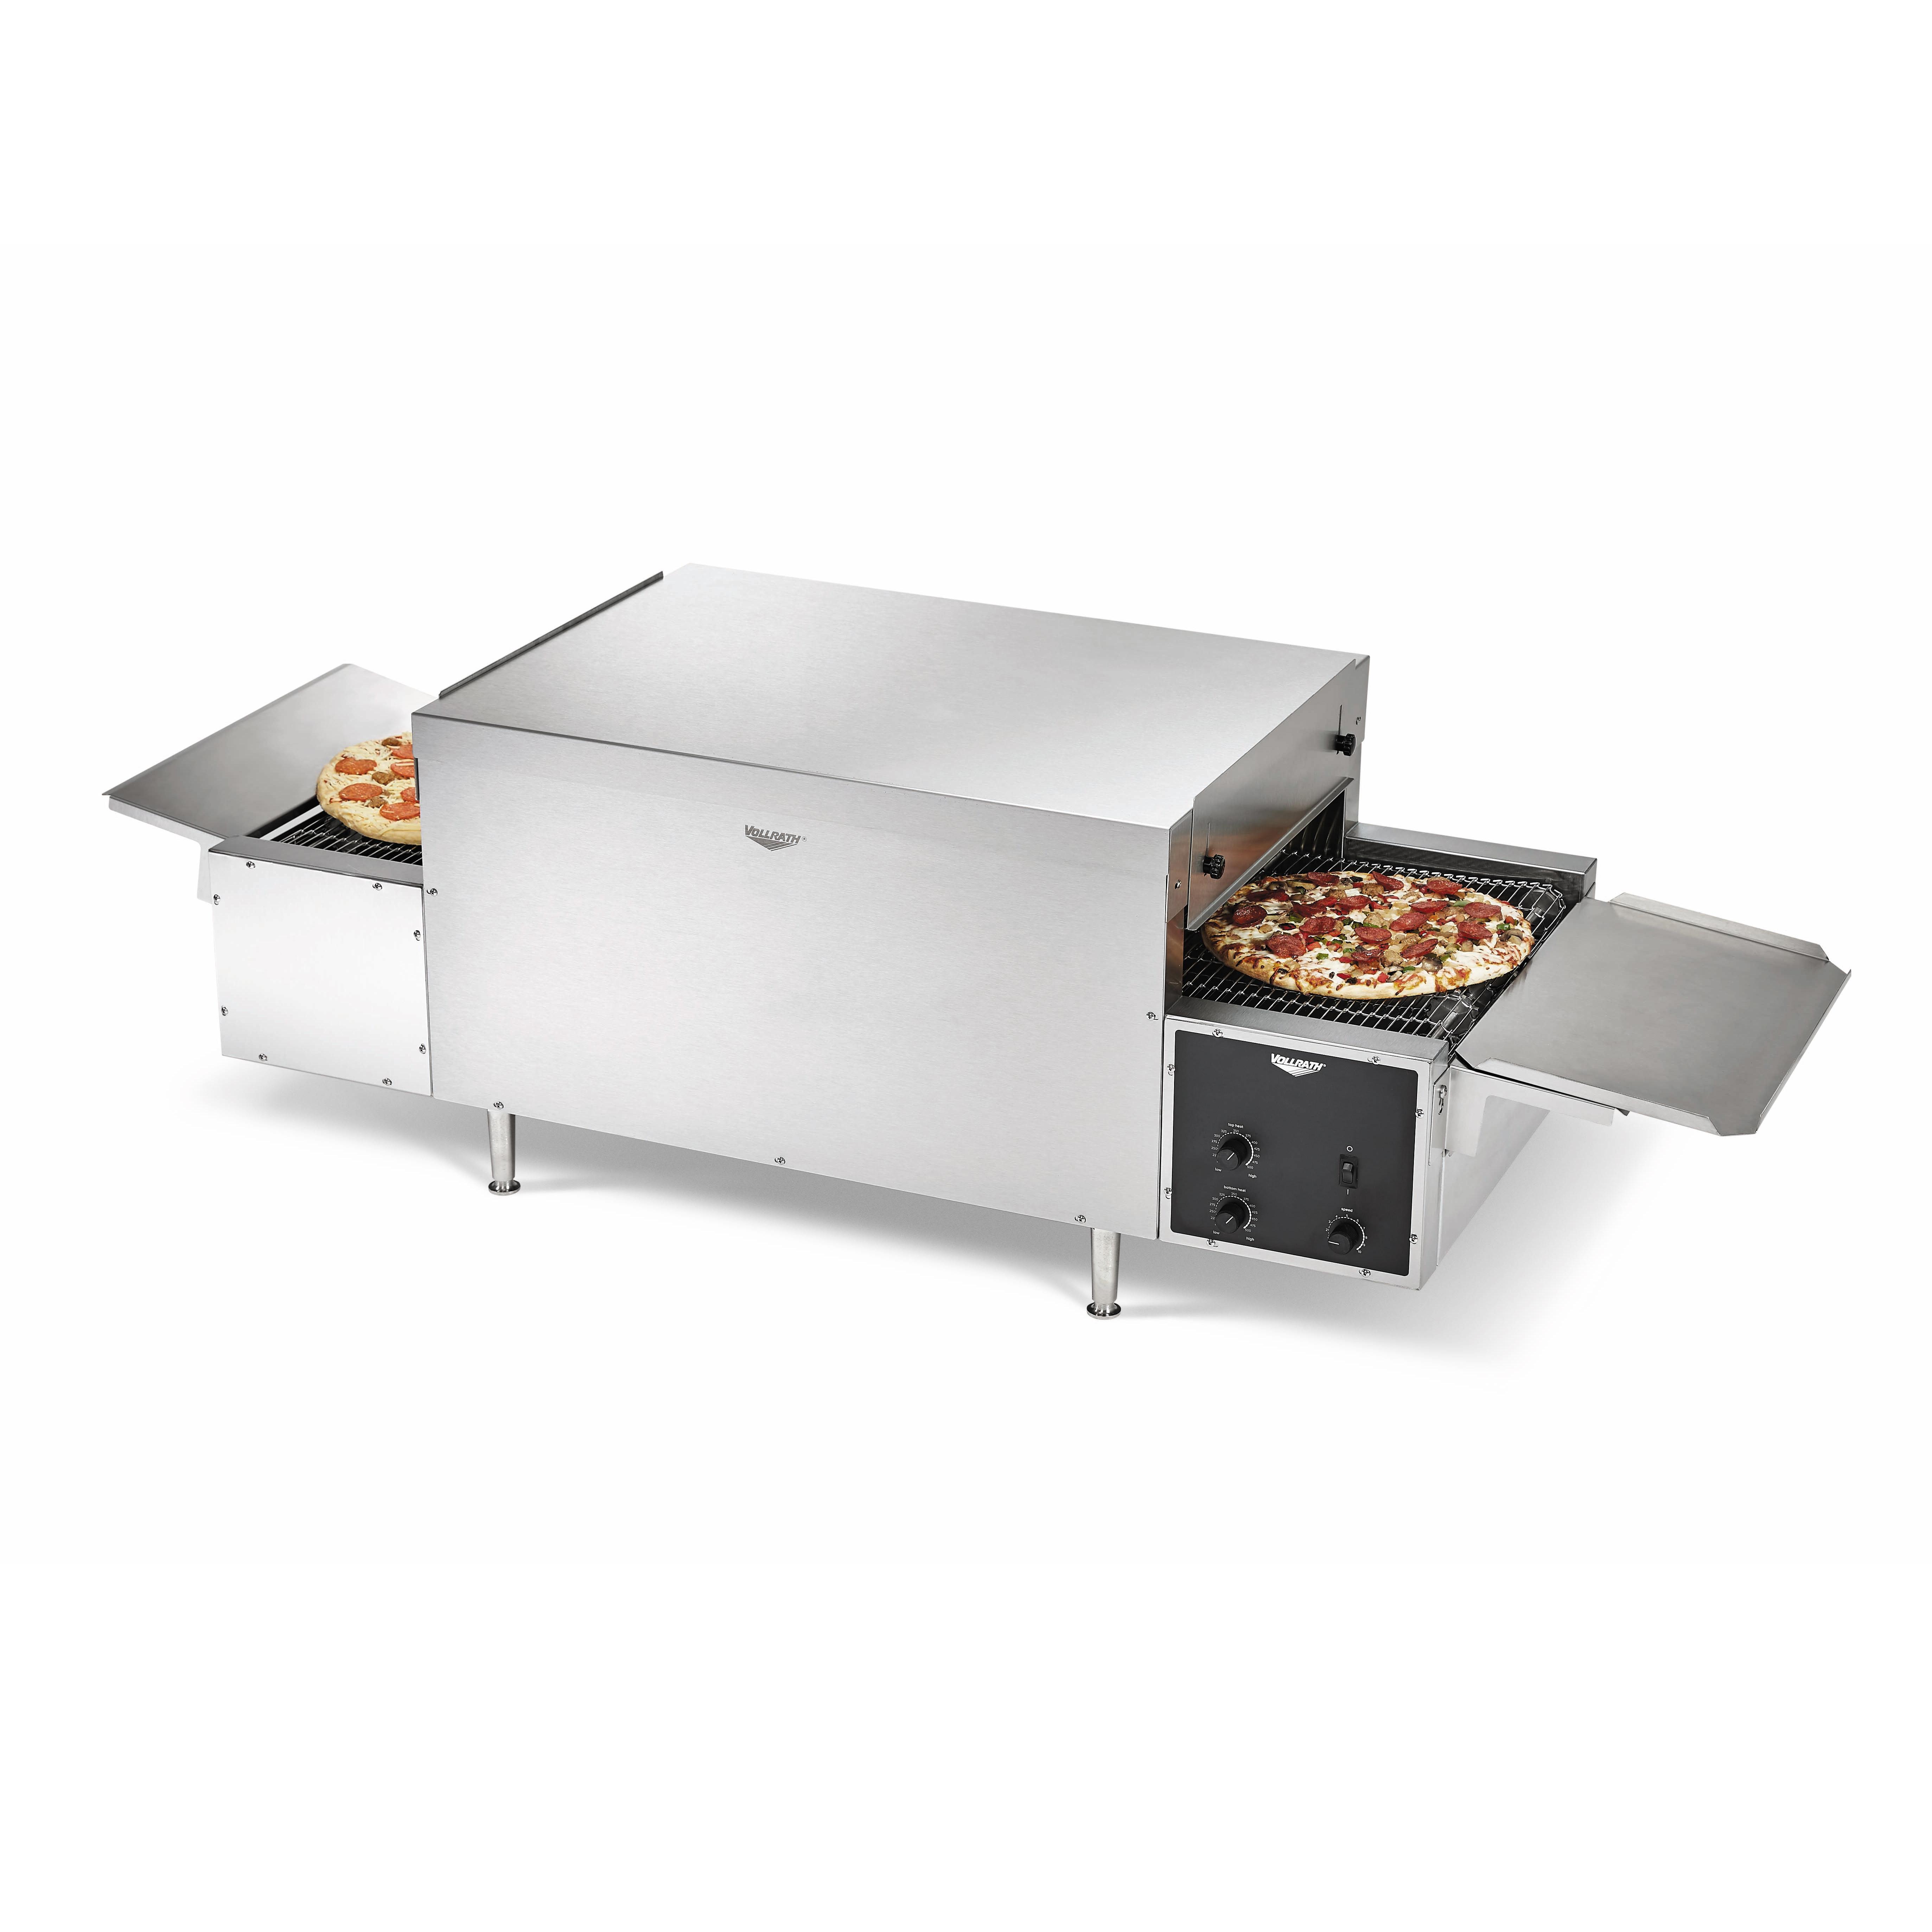 Vollrath PO4-22018R-L oven, electric, conveyor